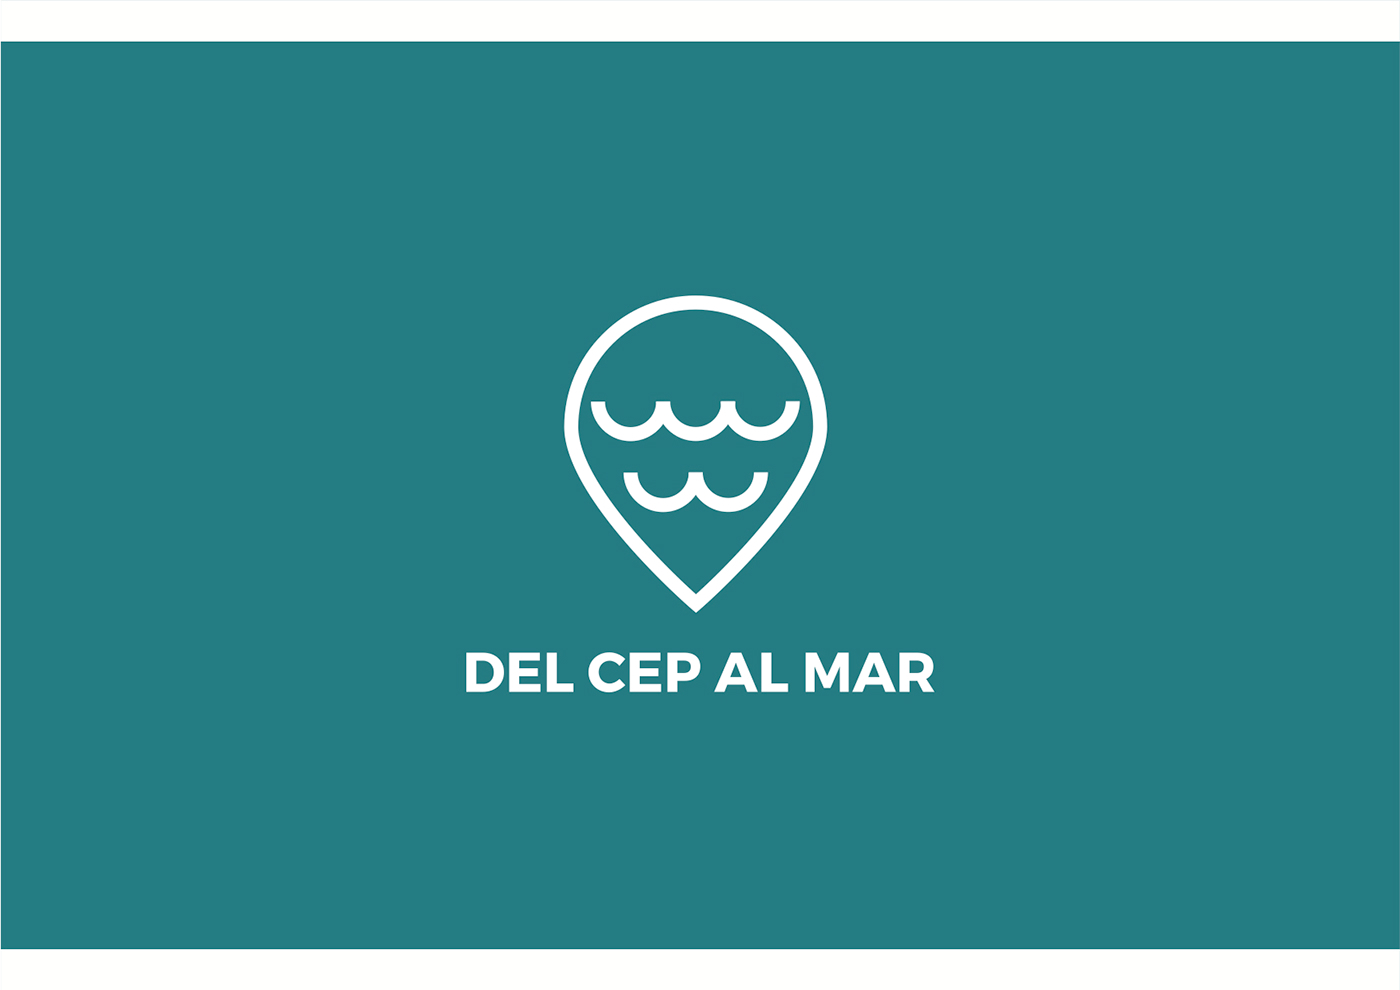 cep mar logo Logotipo Logotype flyer Recorrido mapa Iconos